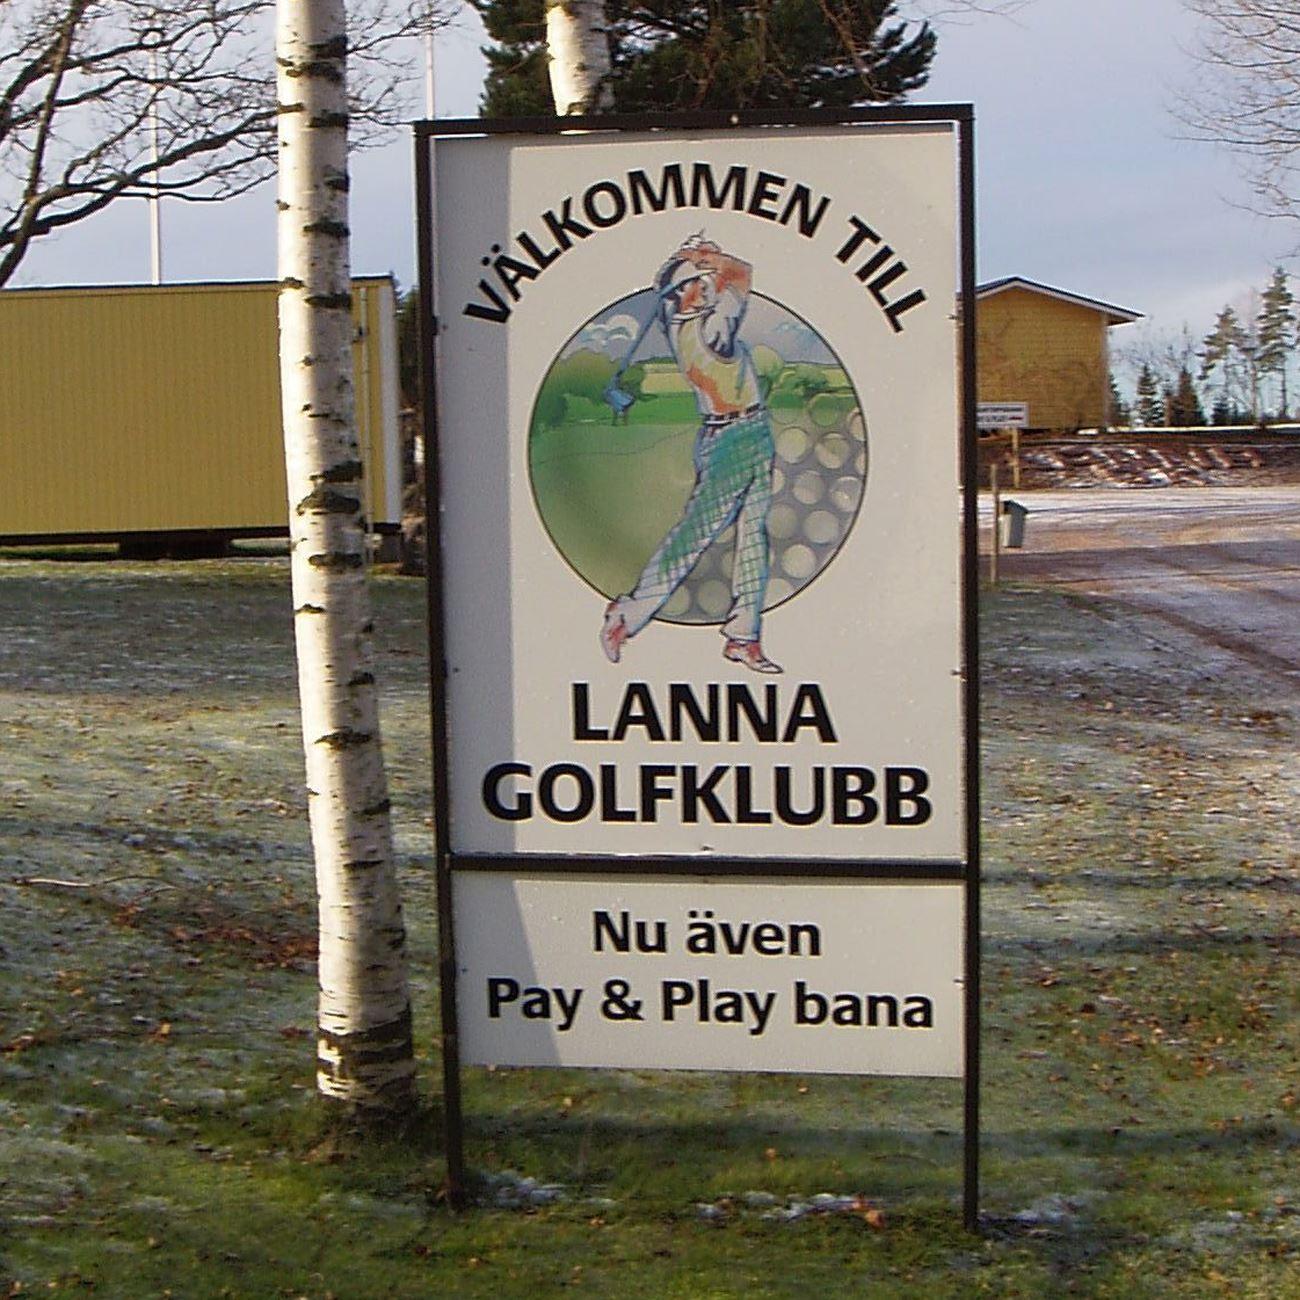 Värnamo Näringsliv AB,  © Värnamo Näringsliv AB , Golfclub Lanna